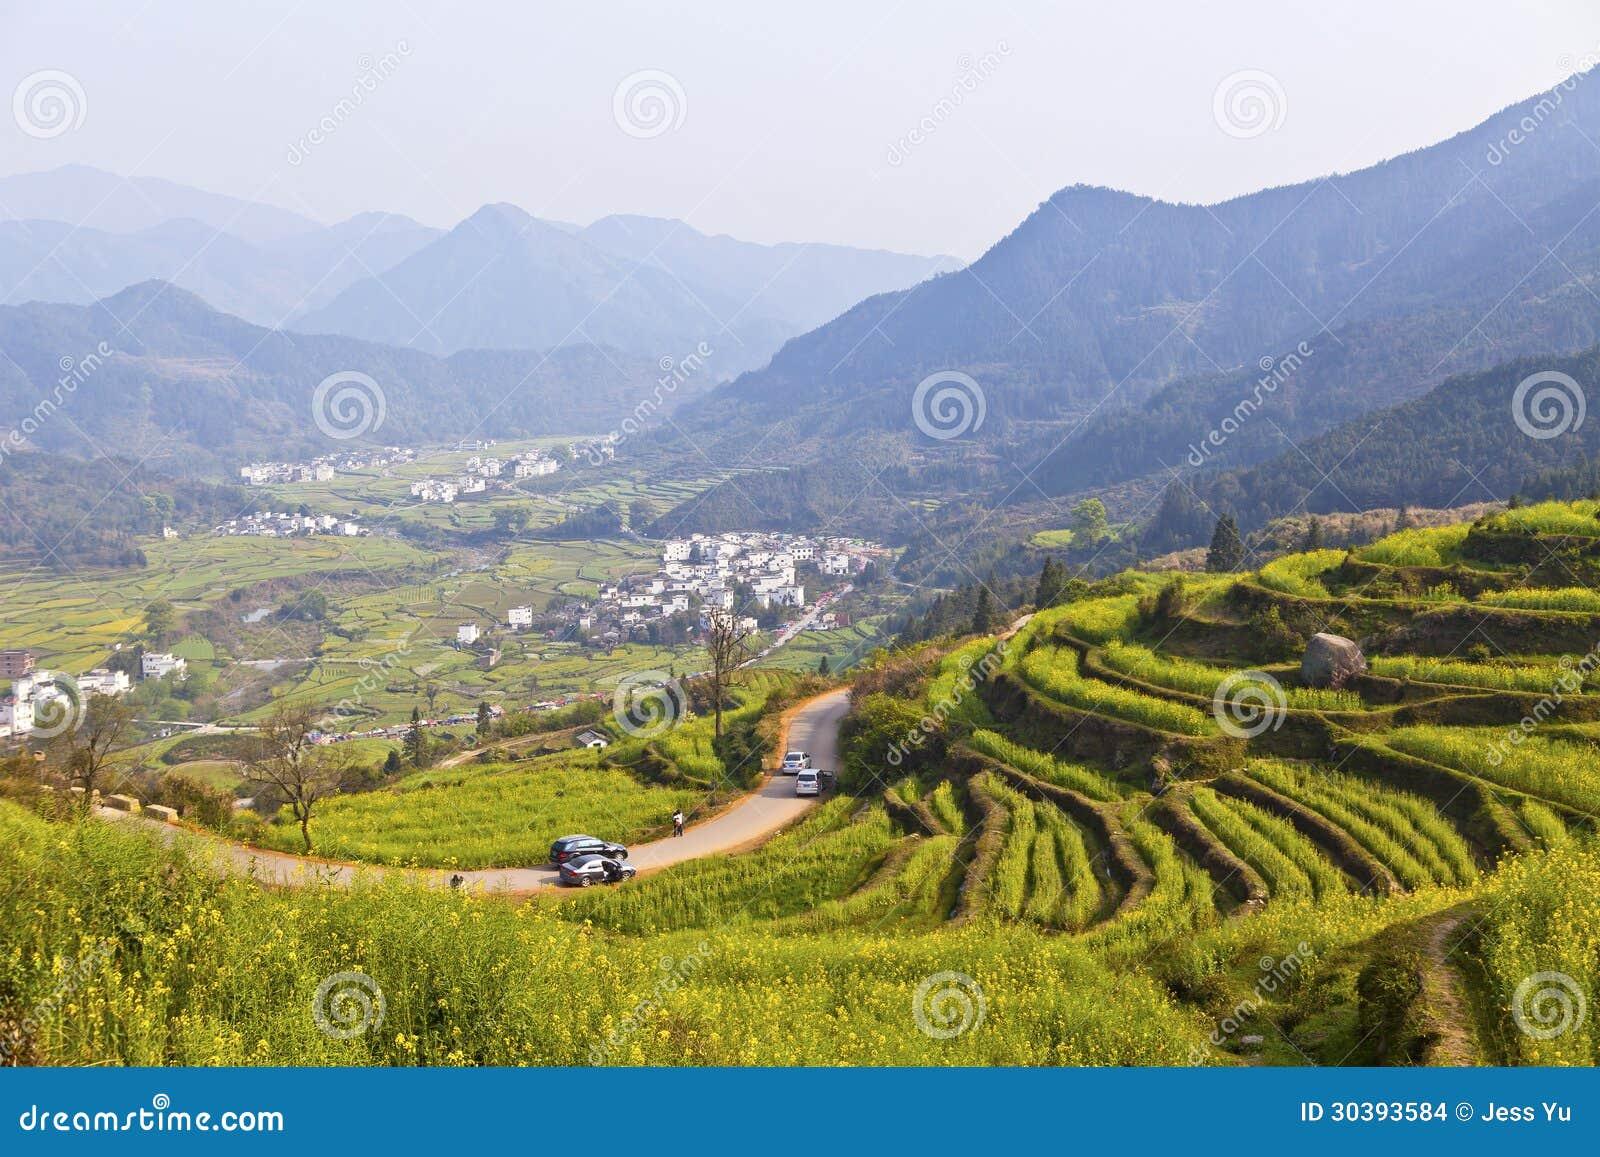 Wuyuan China  city photo : Rural Landscape In Wuyuan, Jiangxi Province, China. Stock Images ...